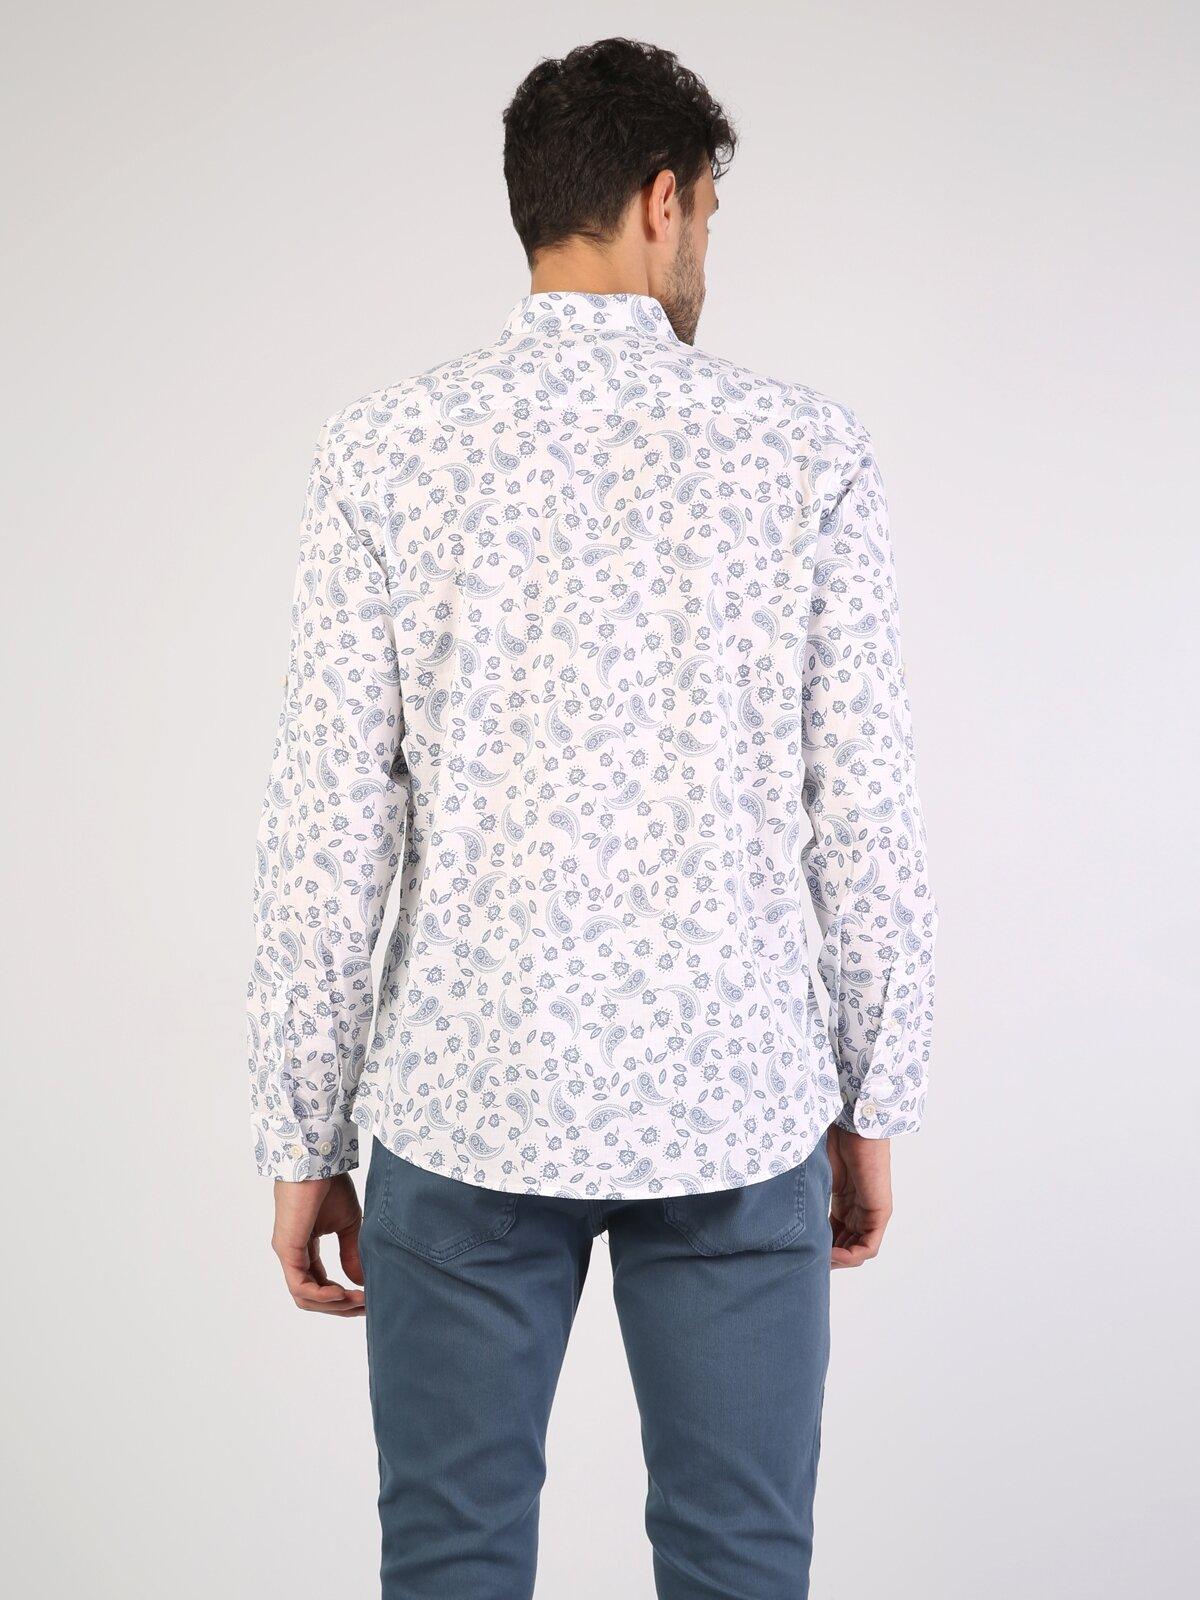 Regular Fit Shirt Neck Erkek Beyaz Uzun Kol Gömlek